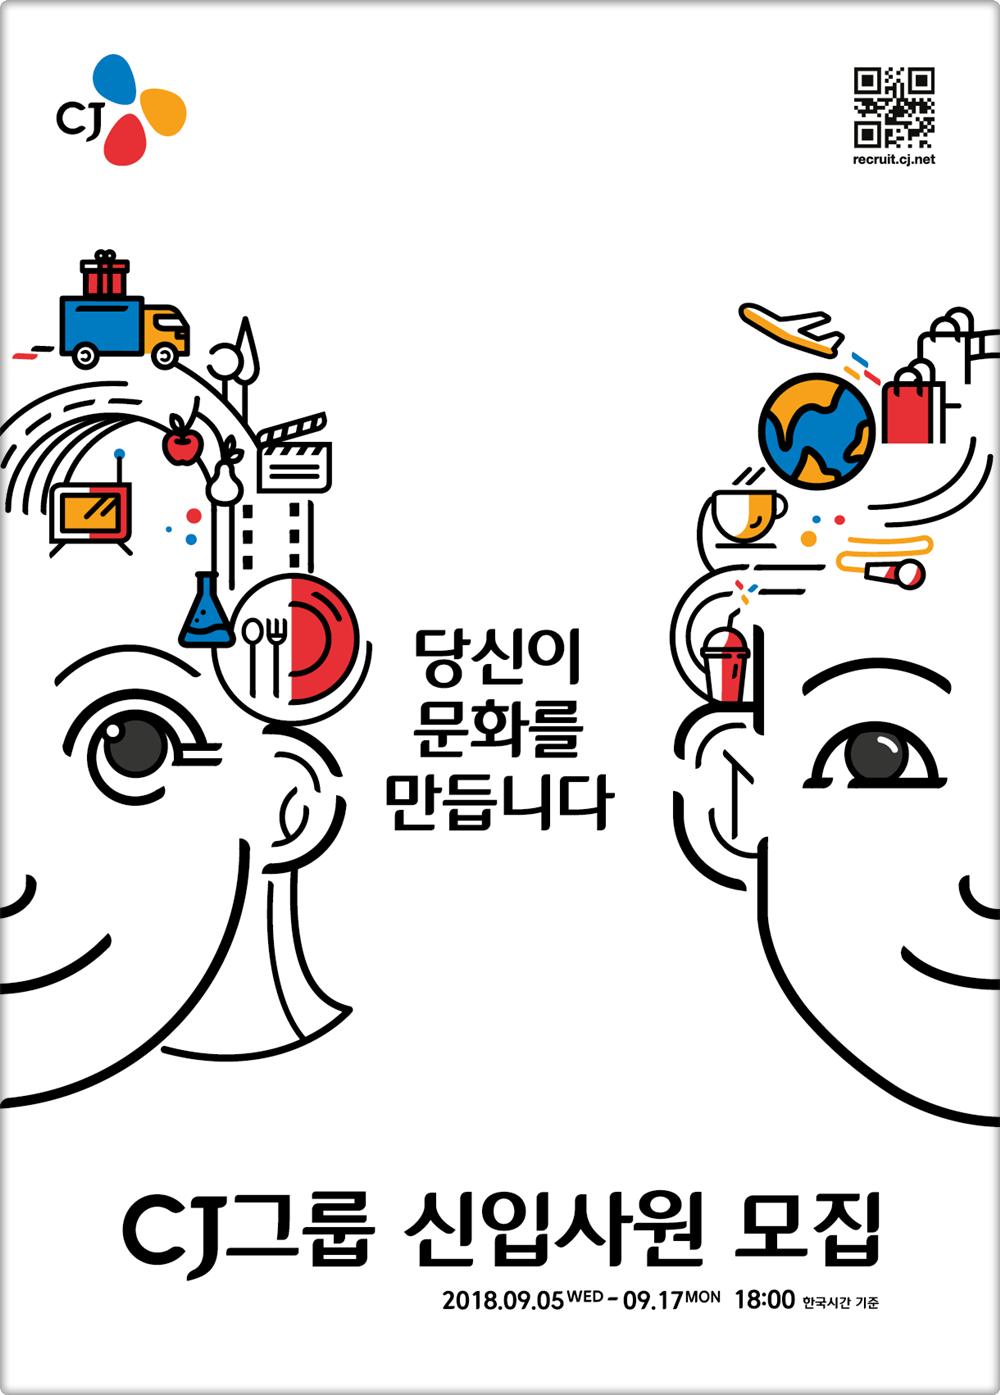 [CJ그룹] 2018 CJ그룹 신입사원 모집_포스터.png